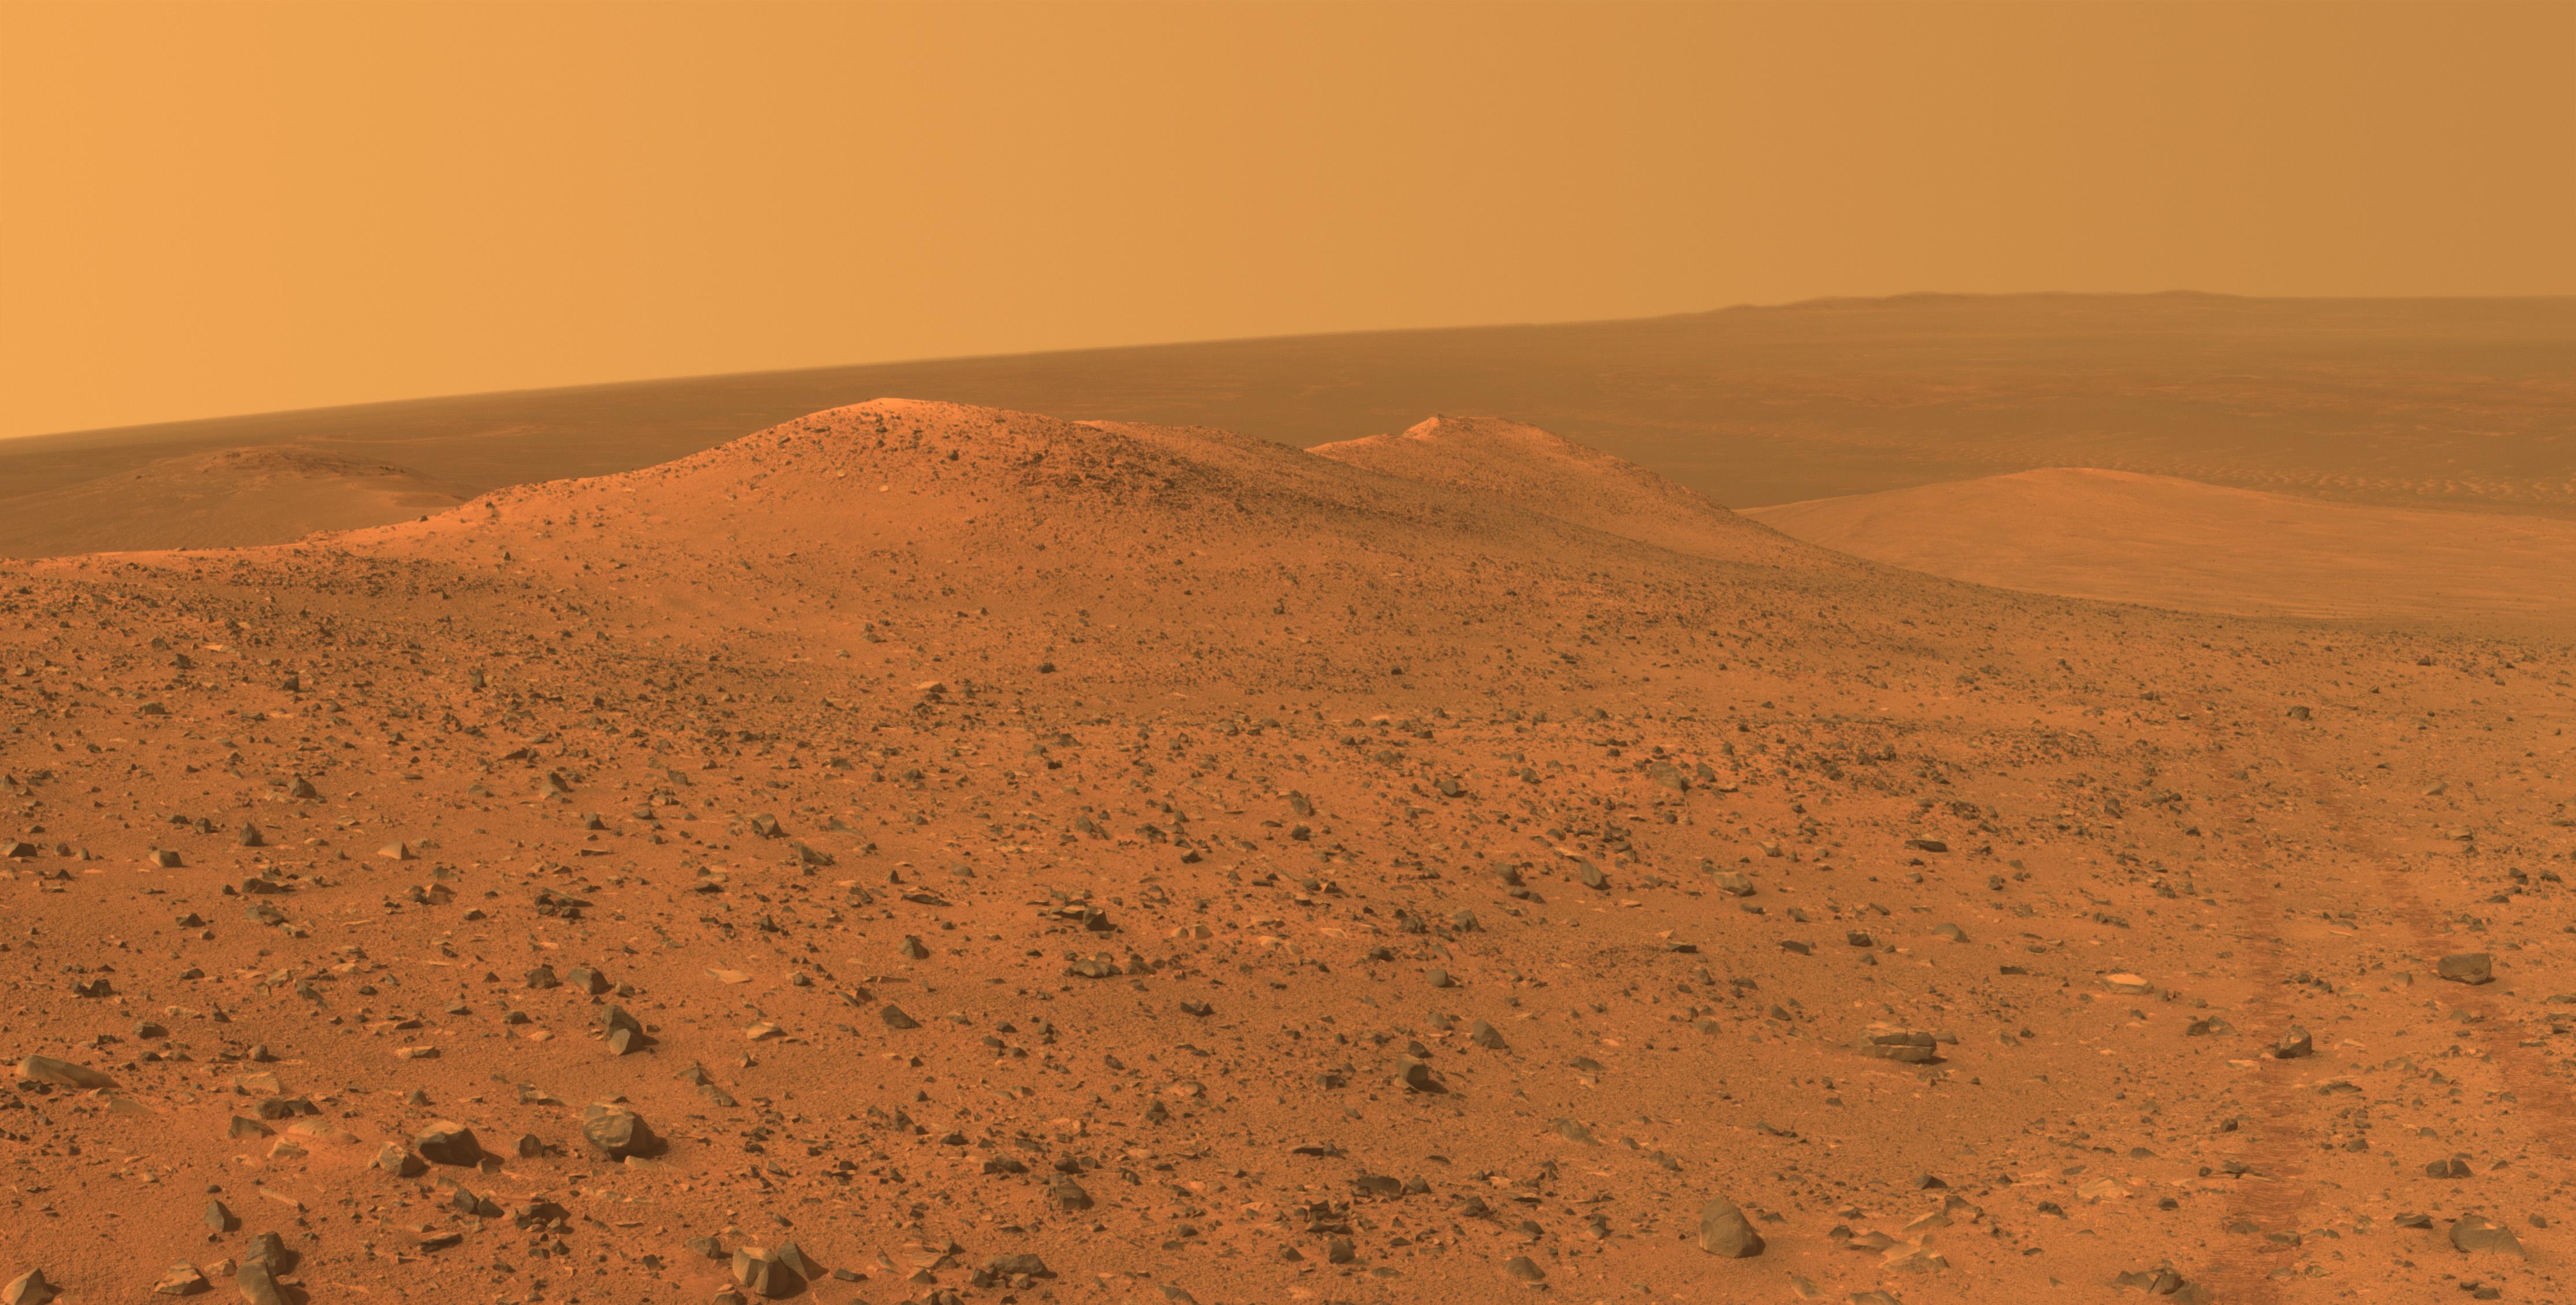 mars landscape images - HD2000×1200